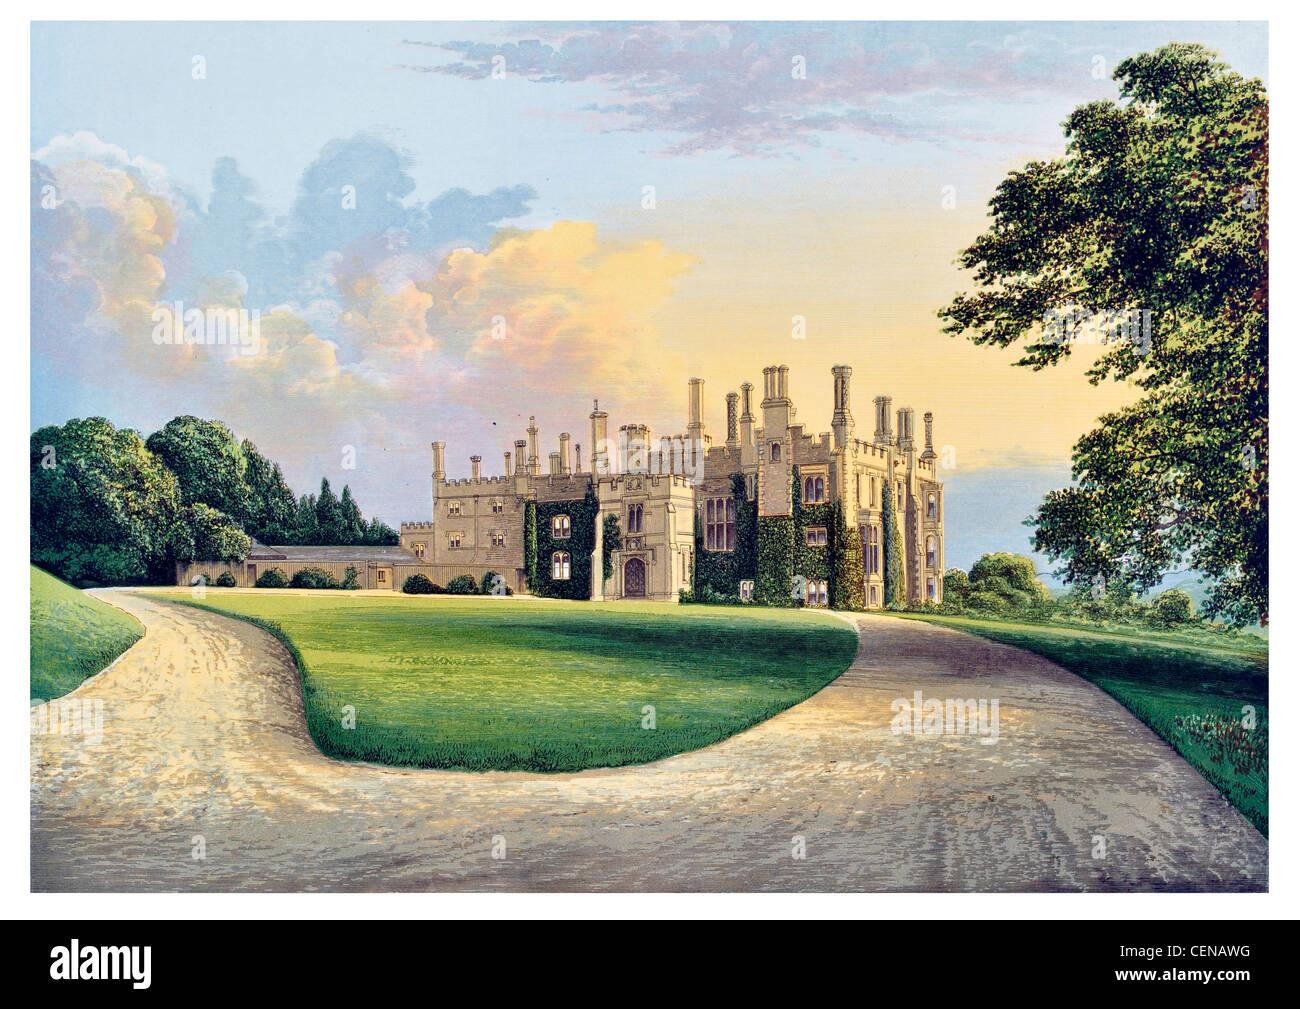 Eggesford House Britain England UK Parkland Park Mansion Manor Stately Home Hall Palace Estate Castle Landscaped Garden